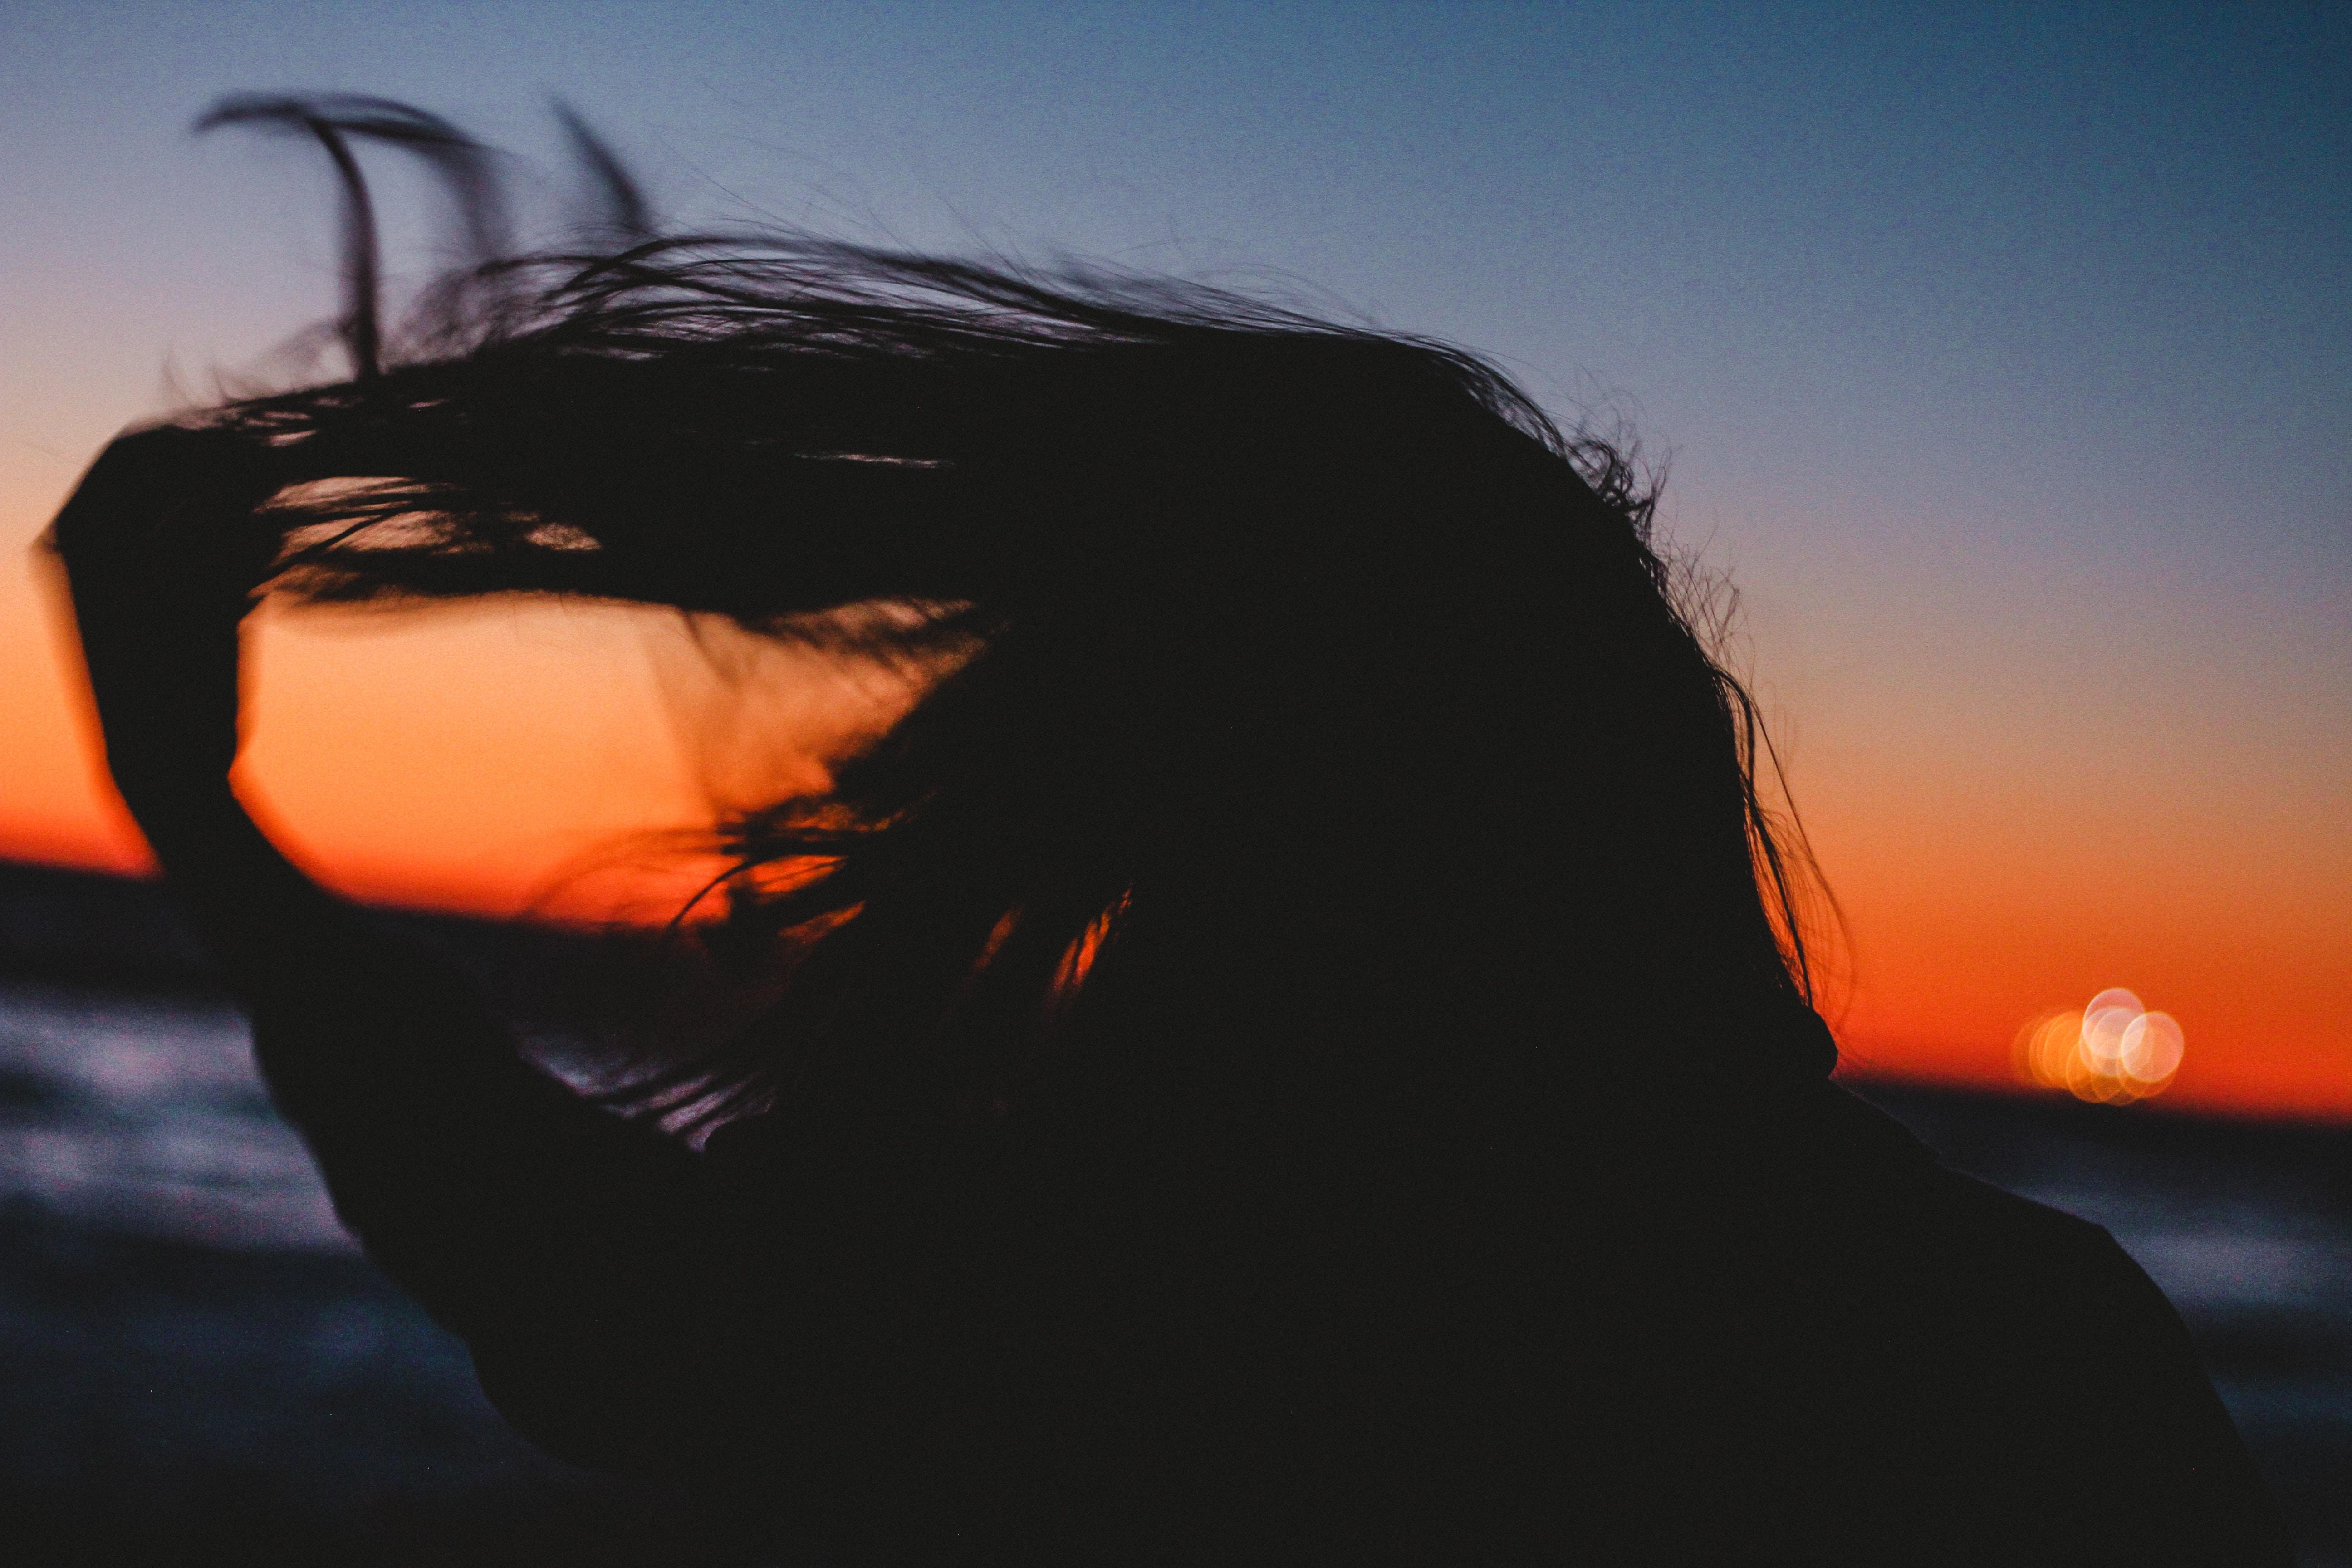 silhouet photo of woman hair